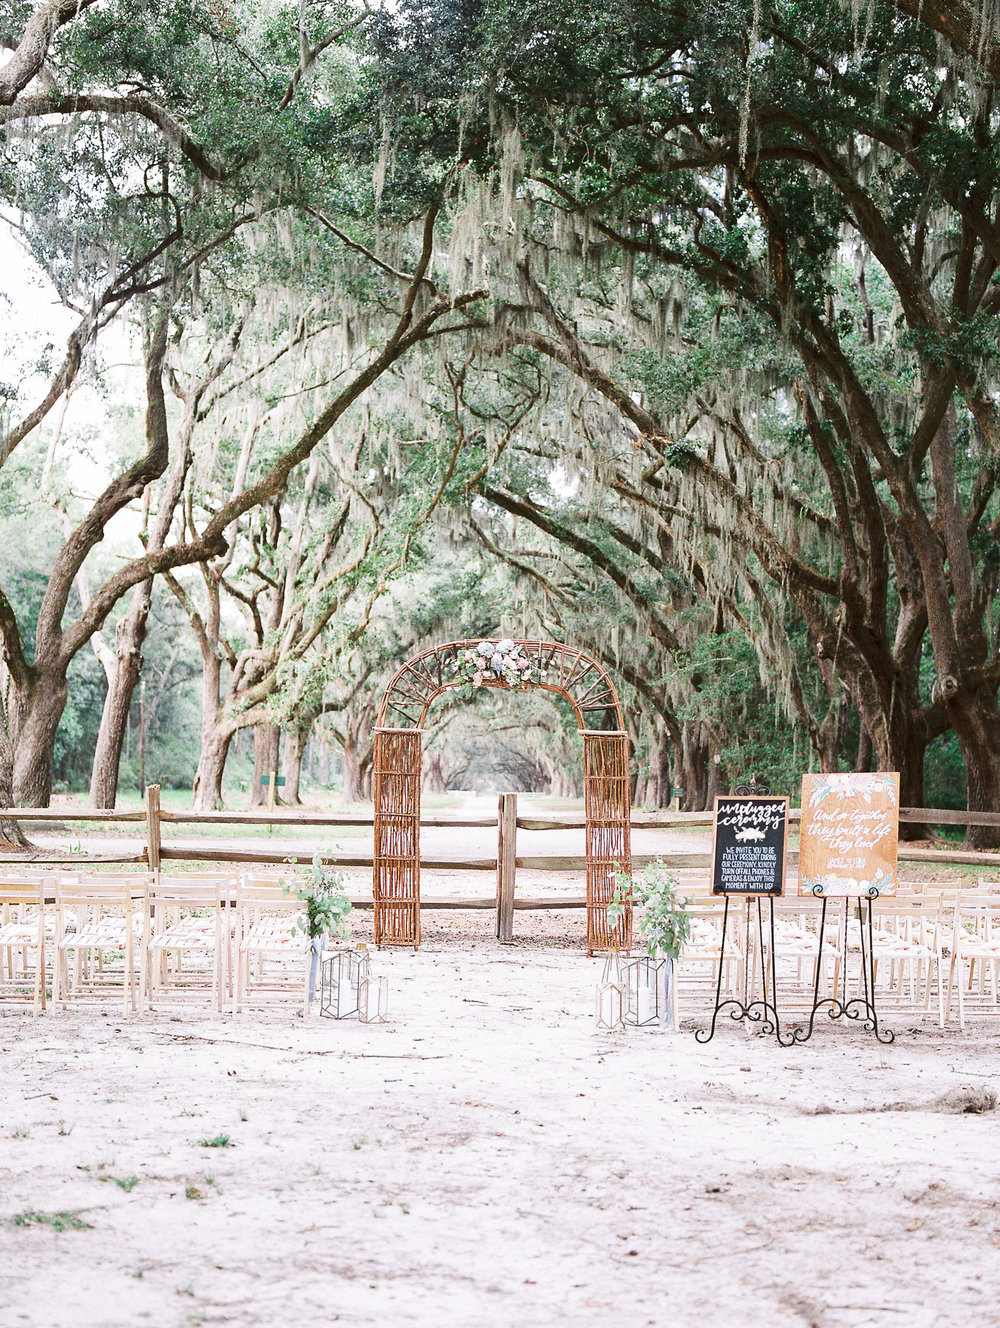 Lura-james-wormsloe-historic-site-hannah-forsberg-atlanta-wedding-photographer-33.jpg